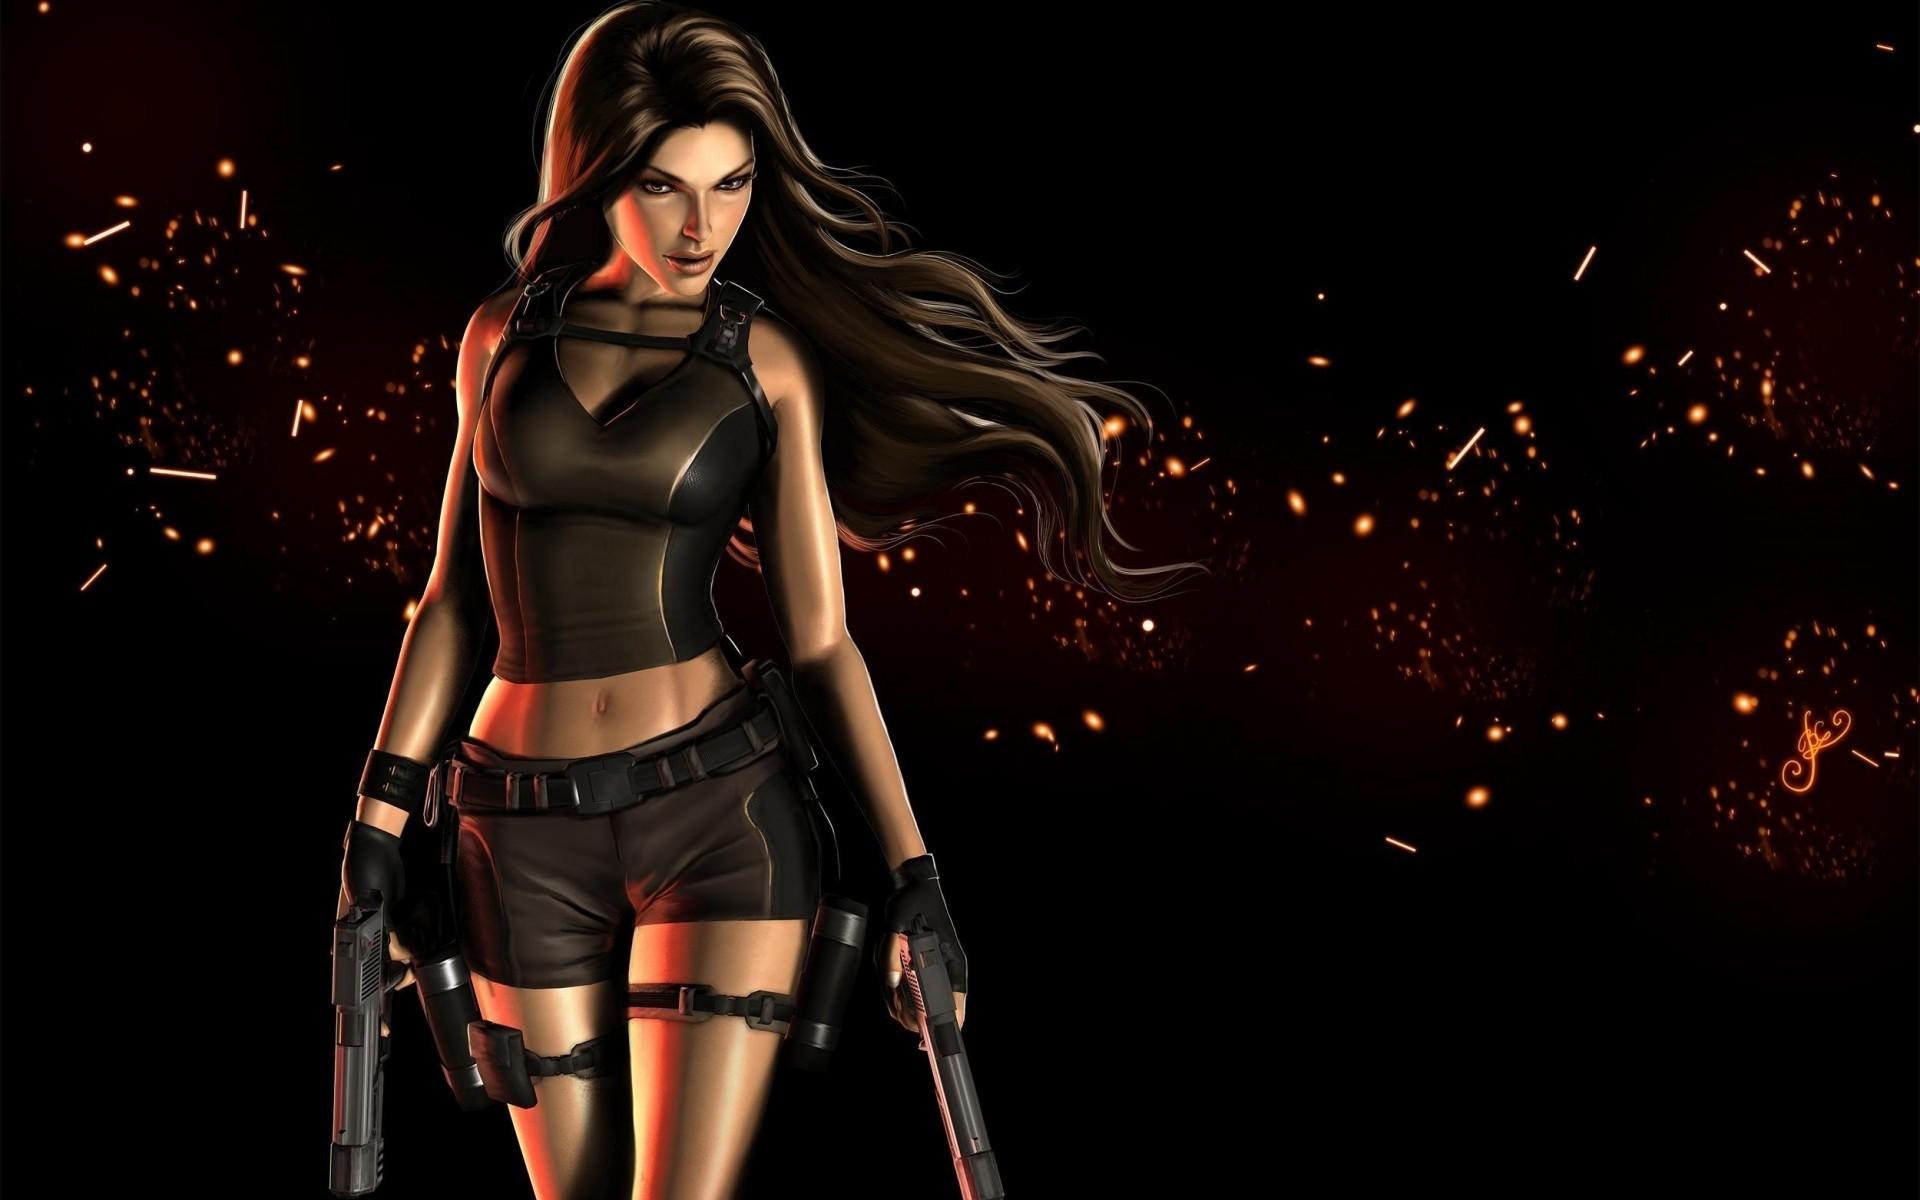 Lara Croft Wallpapers On Desktop